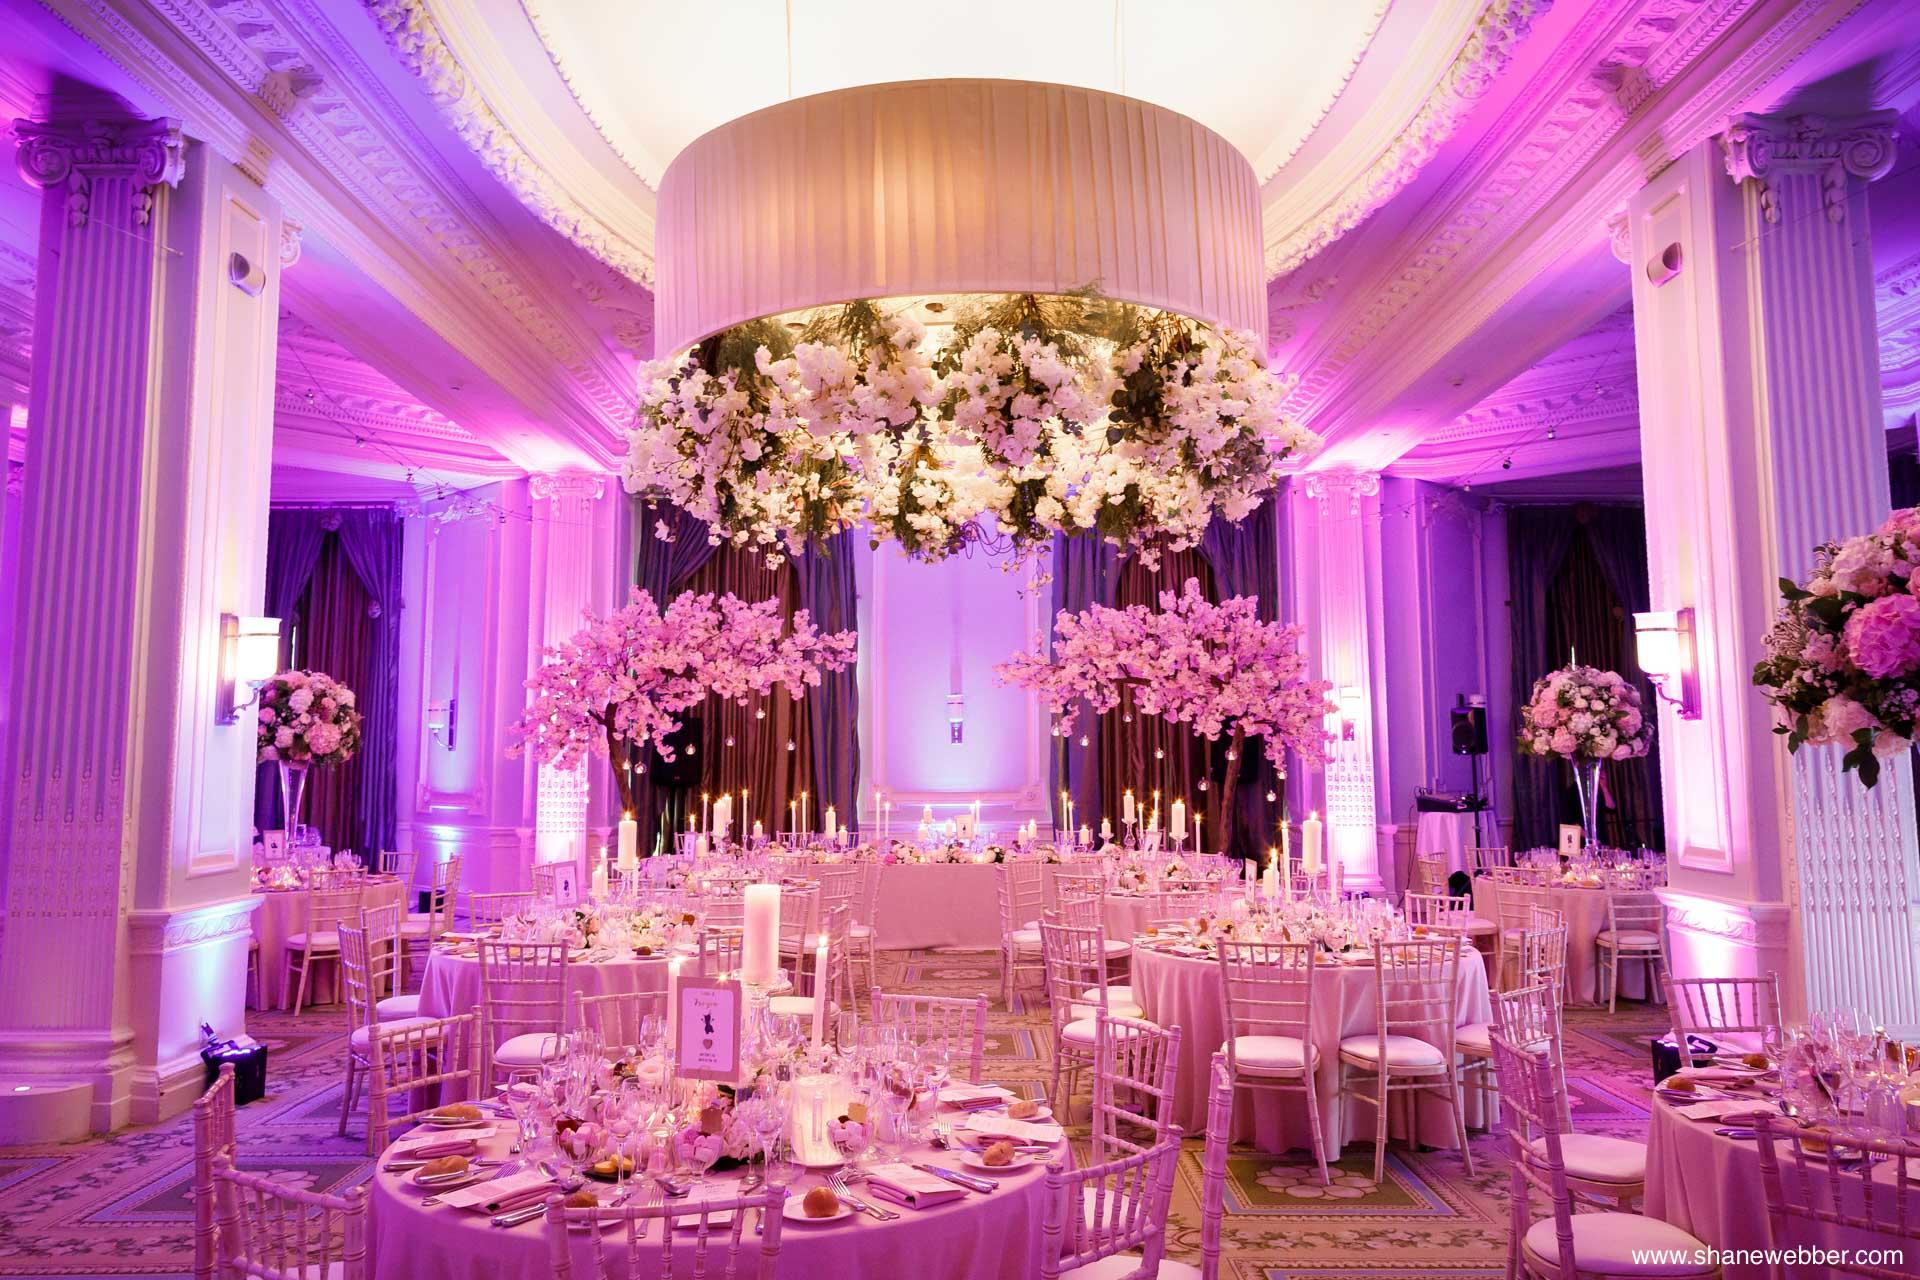 The Midland Manchester wedding reception